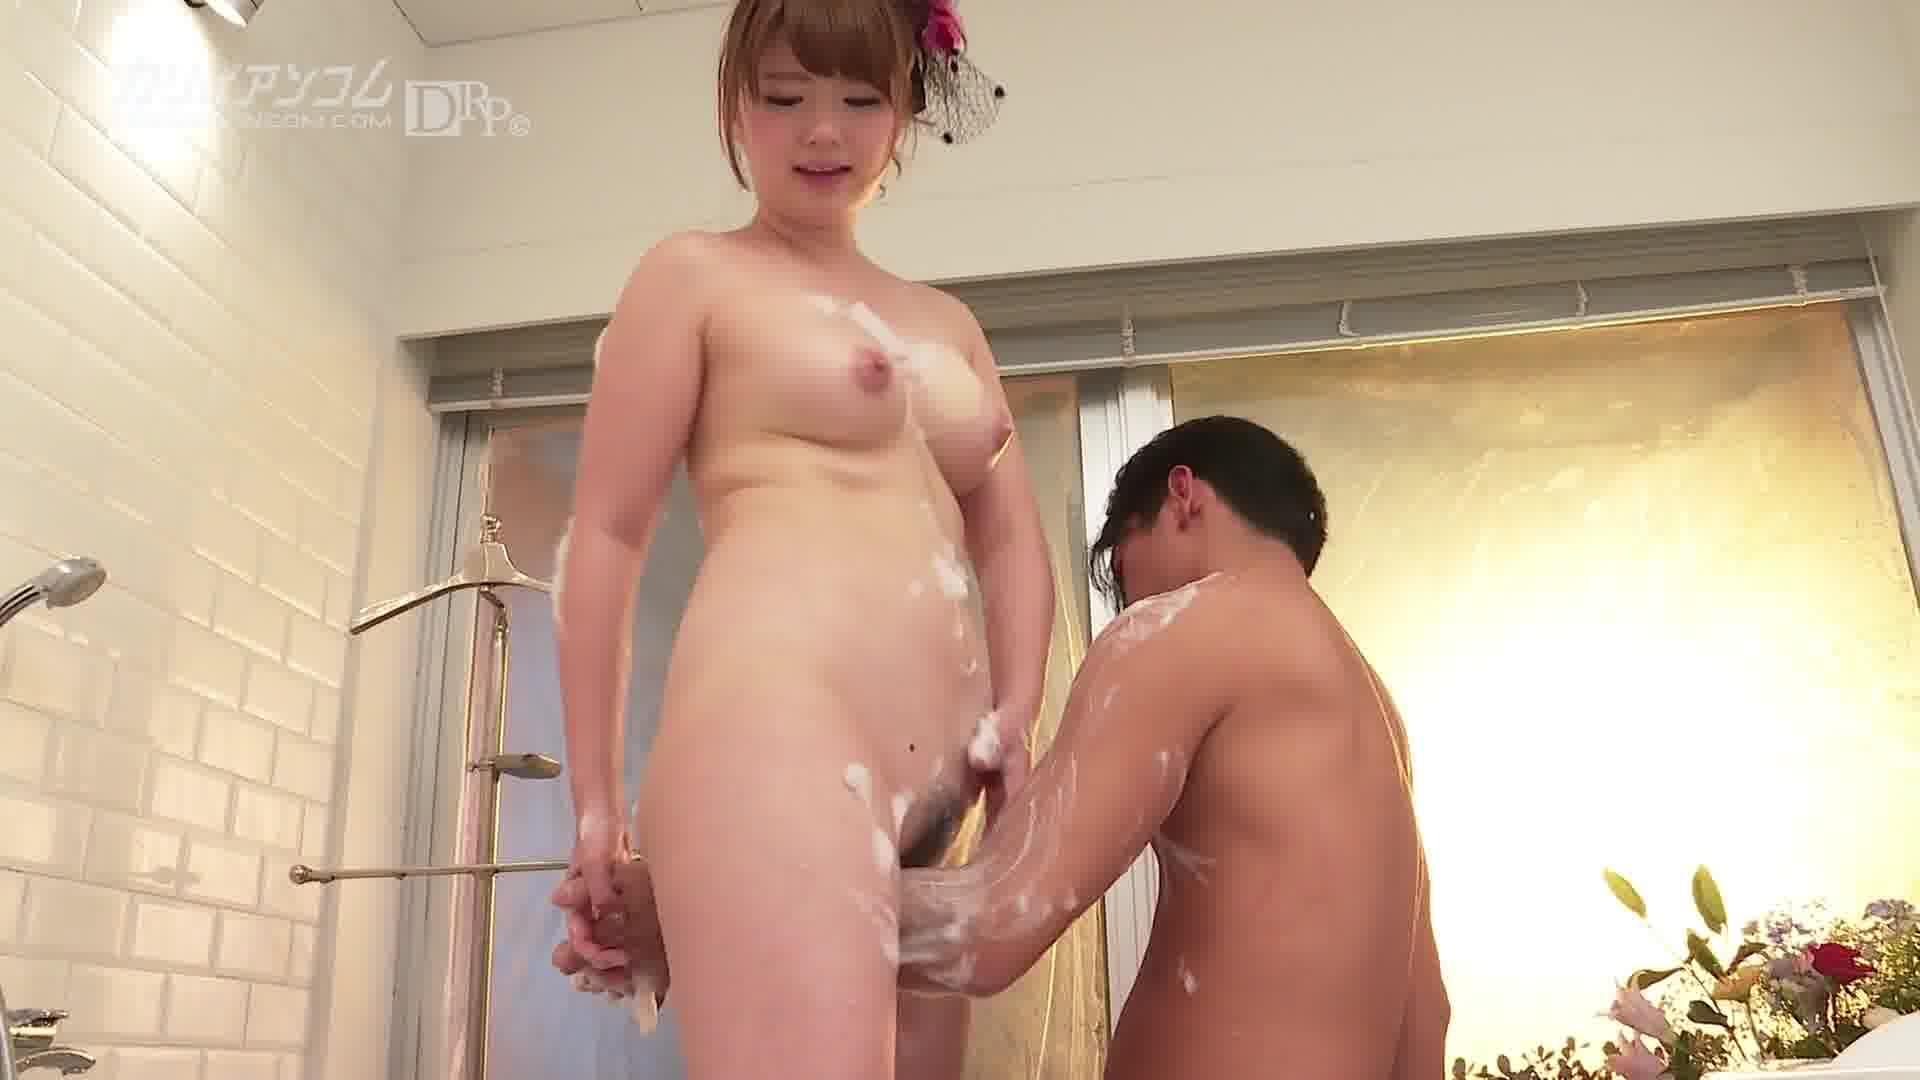 極上泡姫物語 Vol.41 - 西川ゆい【巨乳・美尻・風俗】